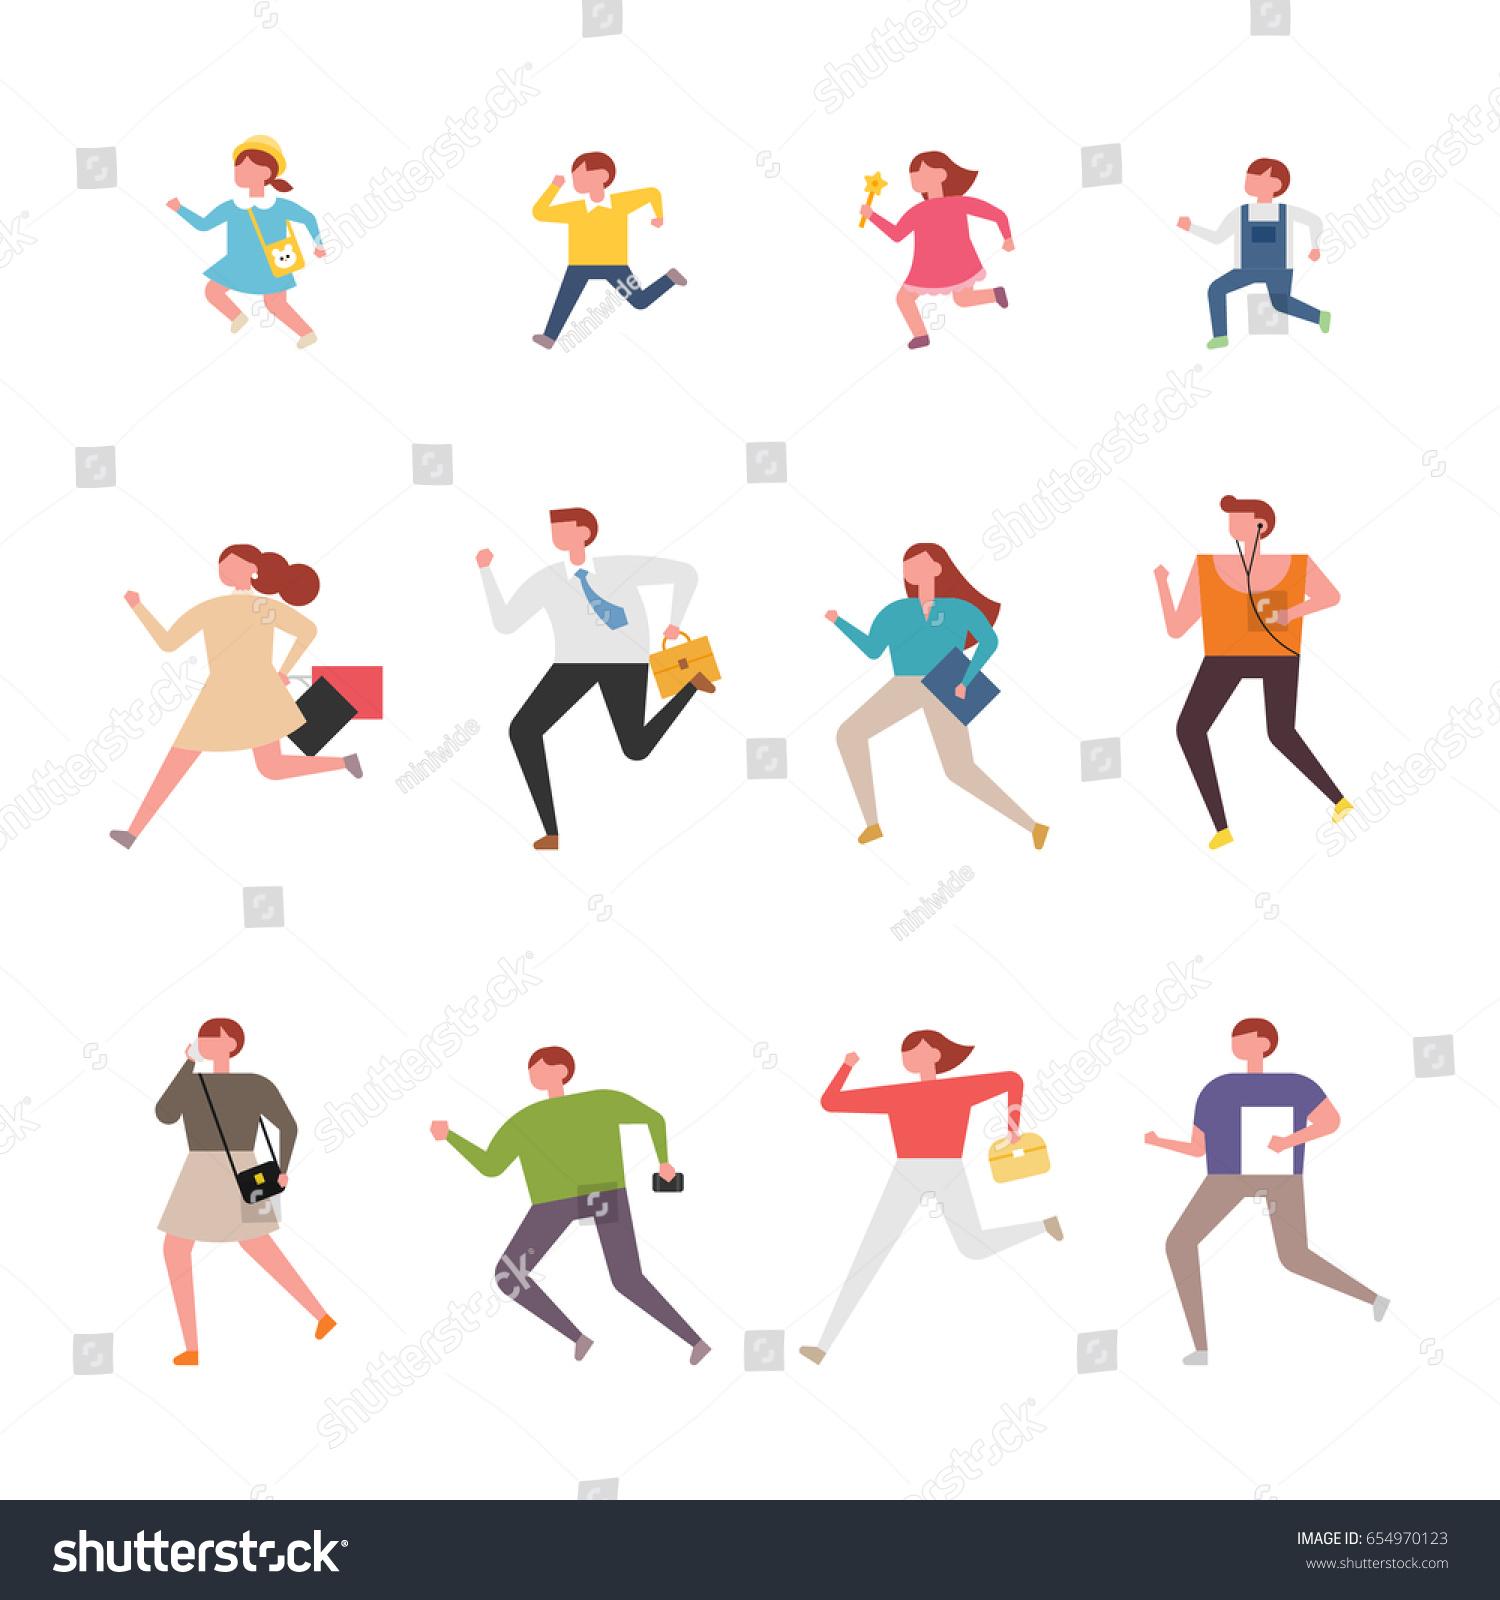 Vector Character Design Illustrator : Running people character vector illustration flat stock